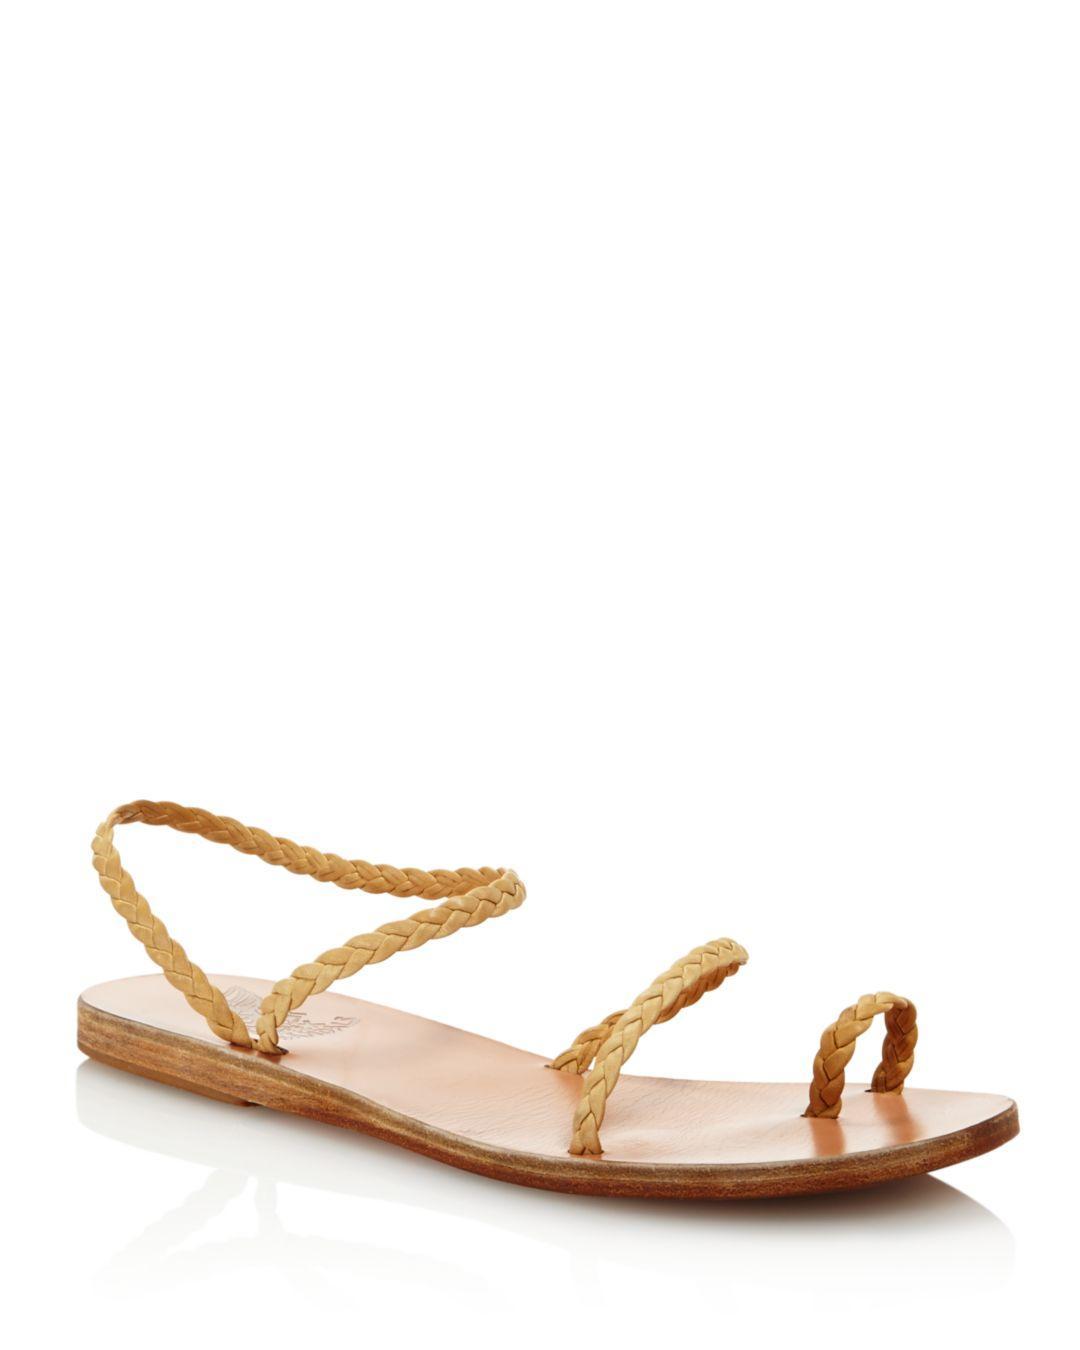 95659020050d66 Lyst - Ancient Greek Sandals Women s Eleftheria Braided Slip-on ...